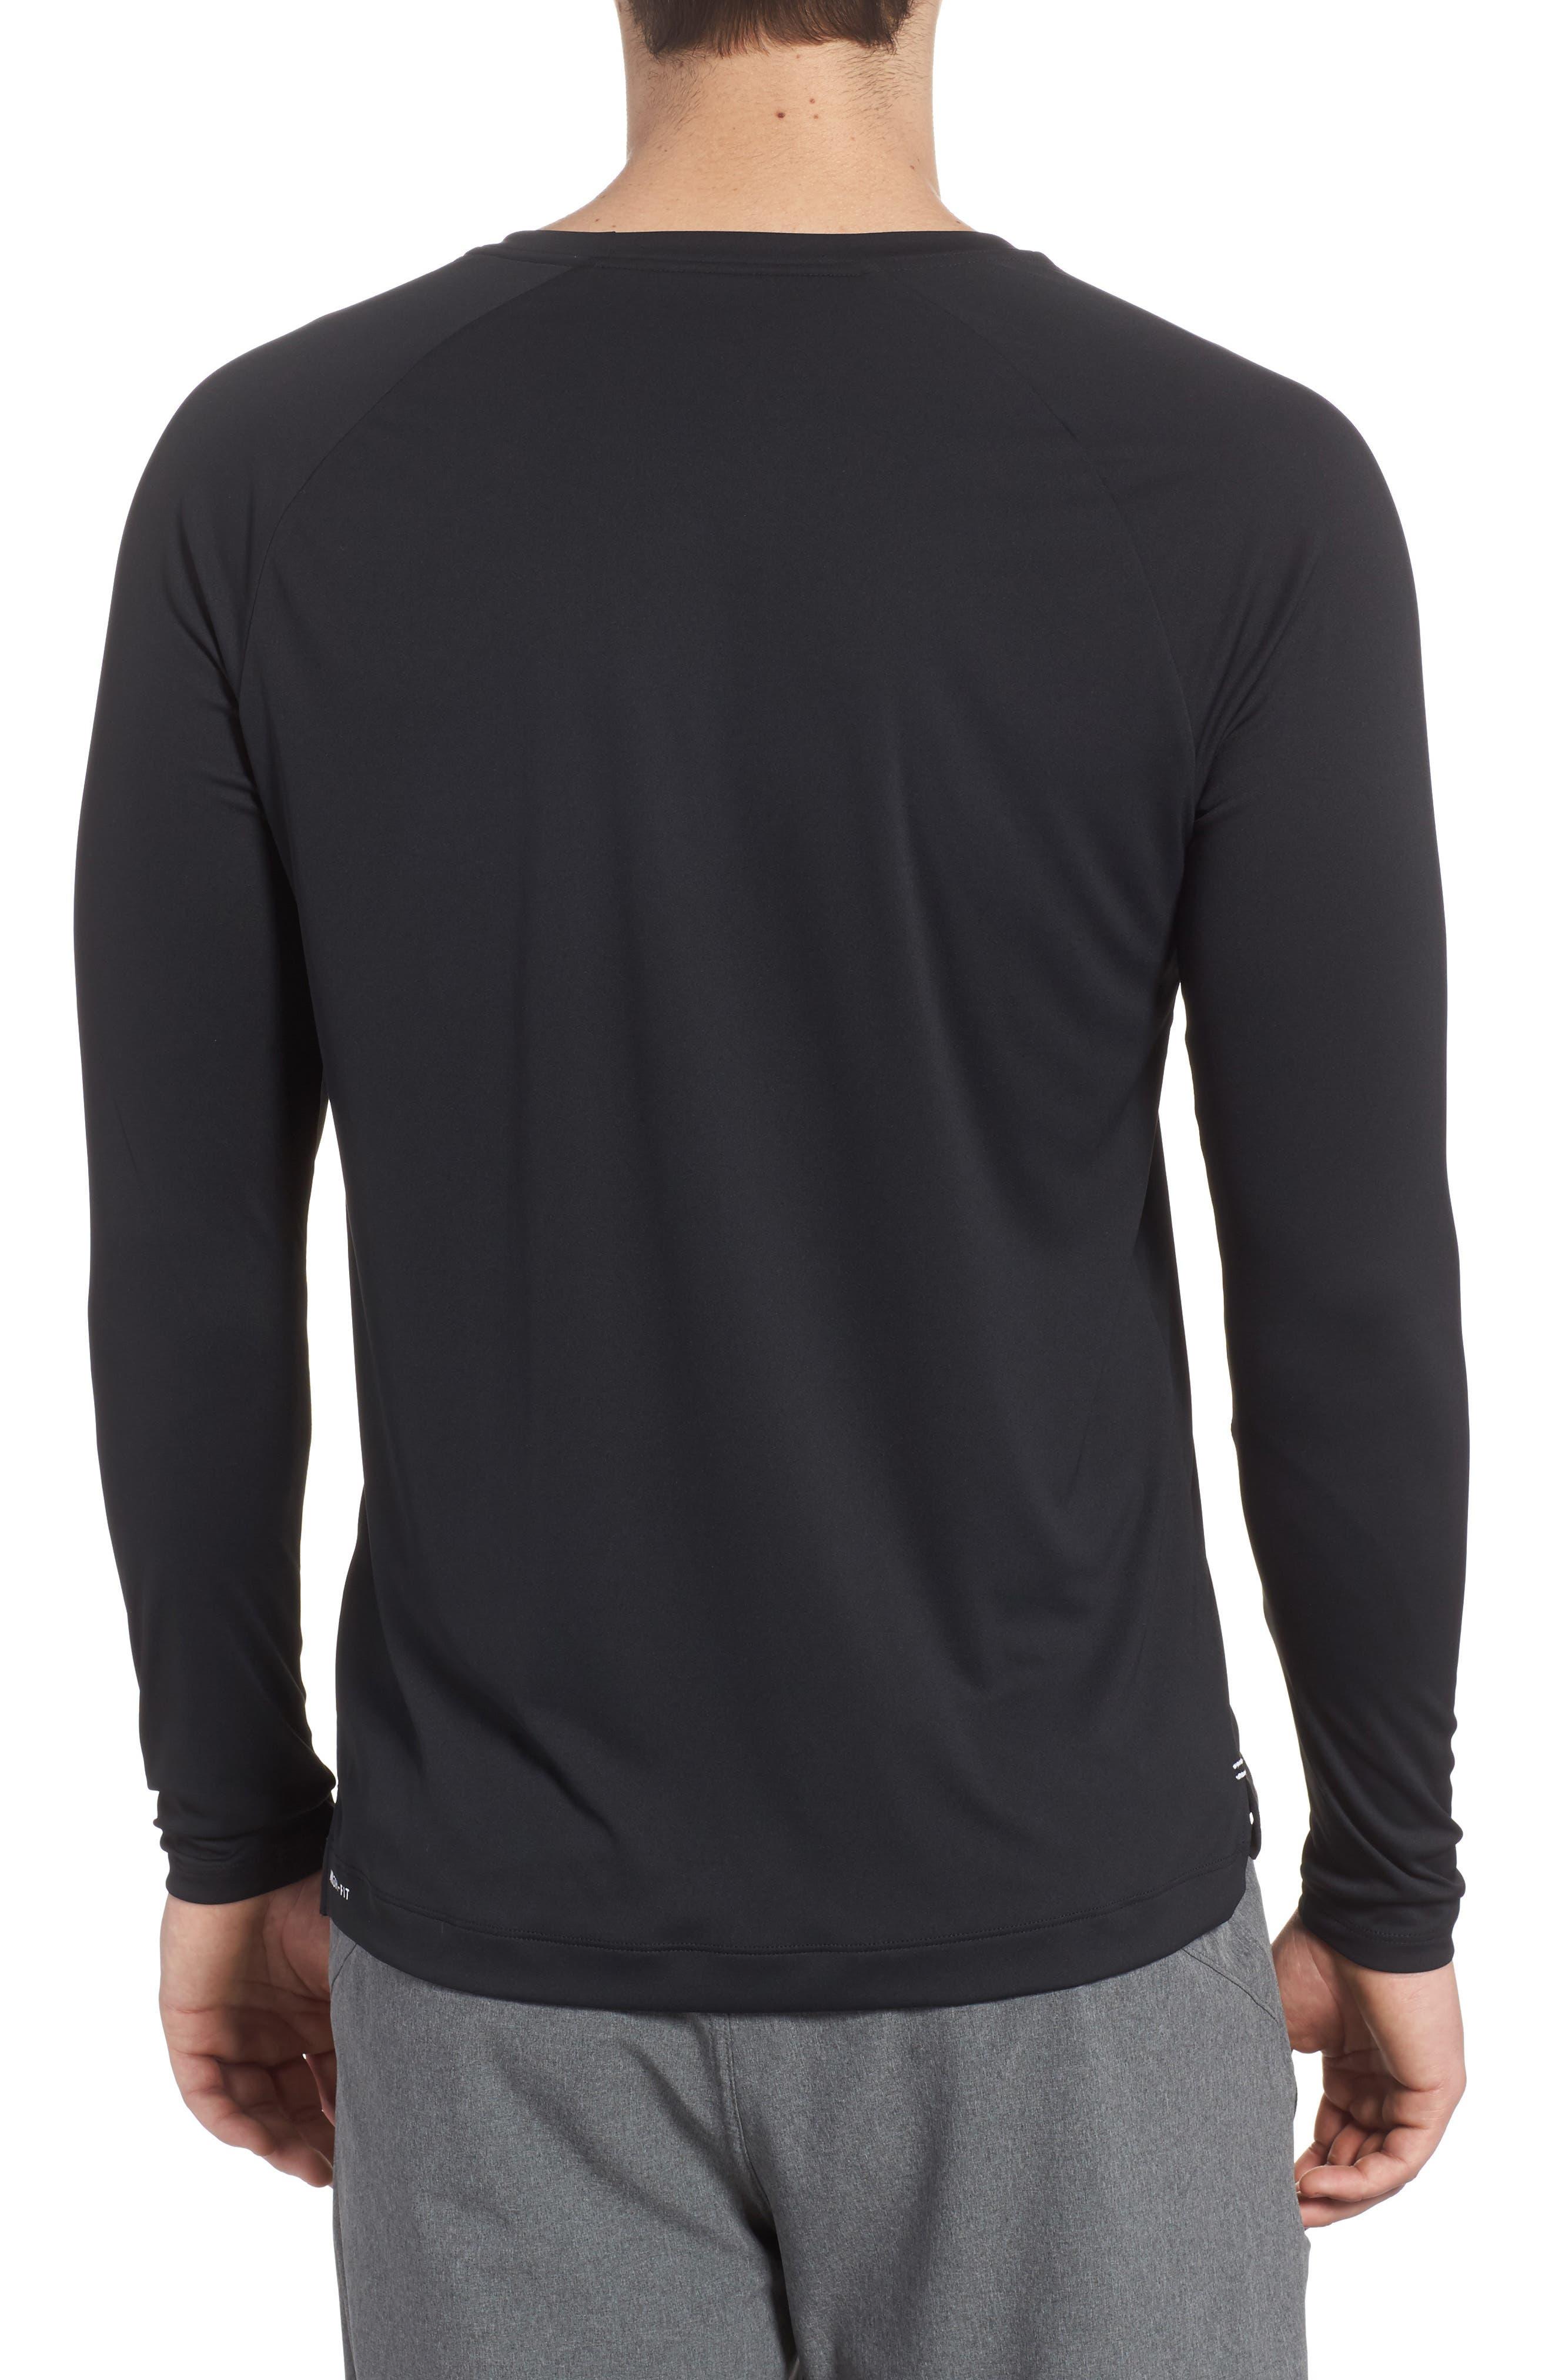 Icon Surf Shirt,                             Alternate thumbnail 2, color,                             010